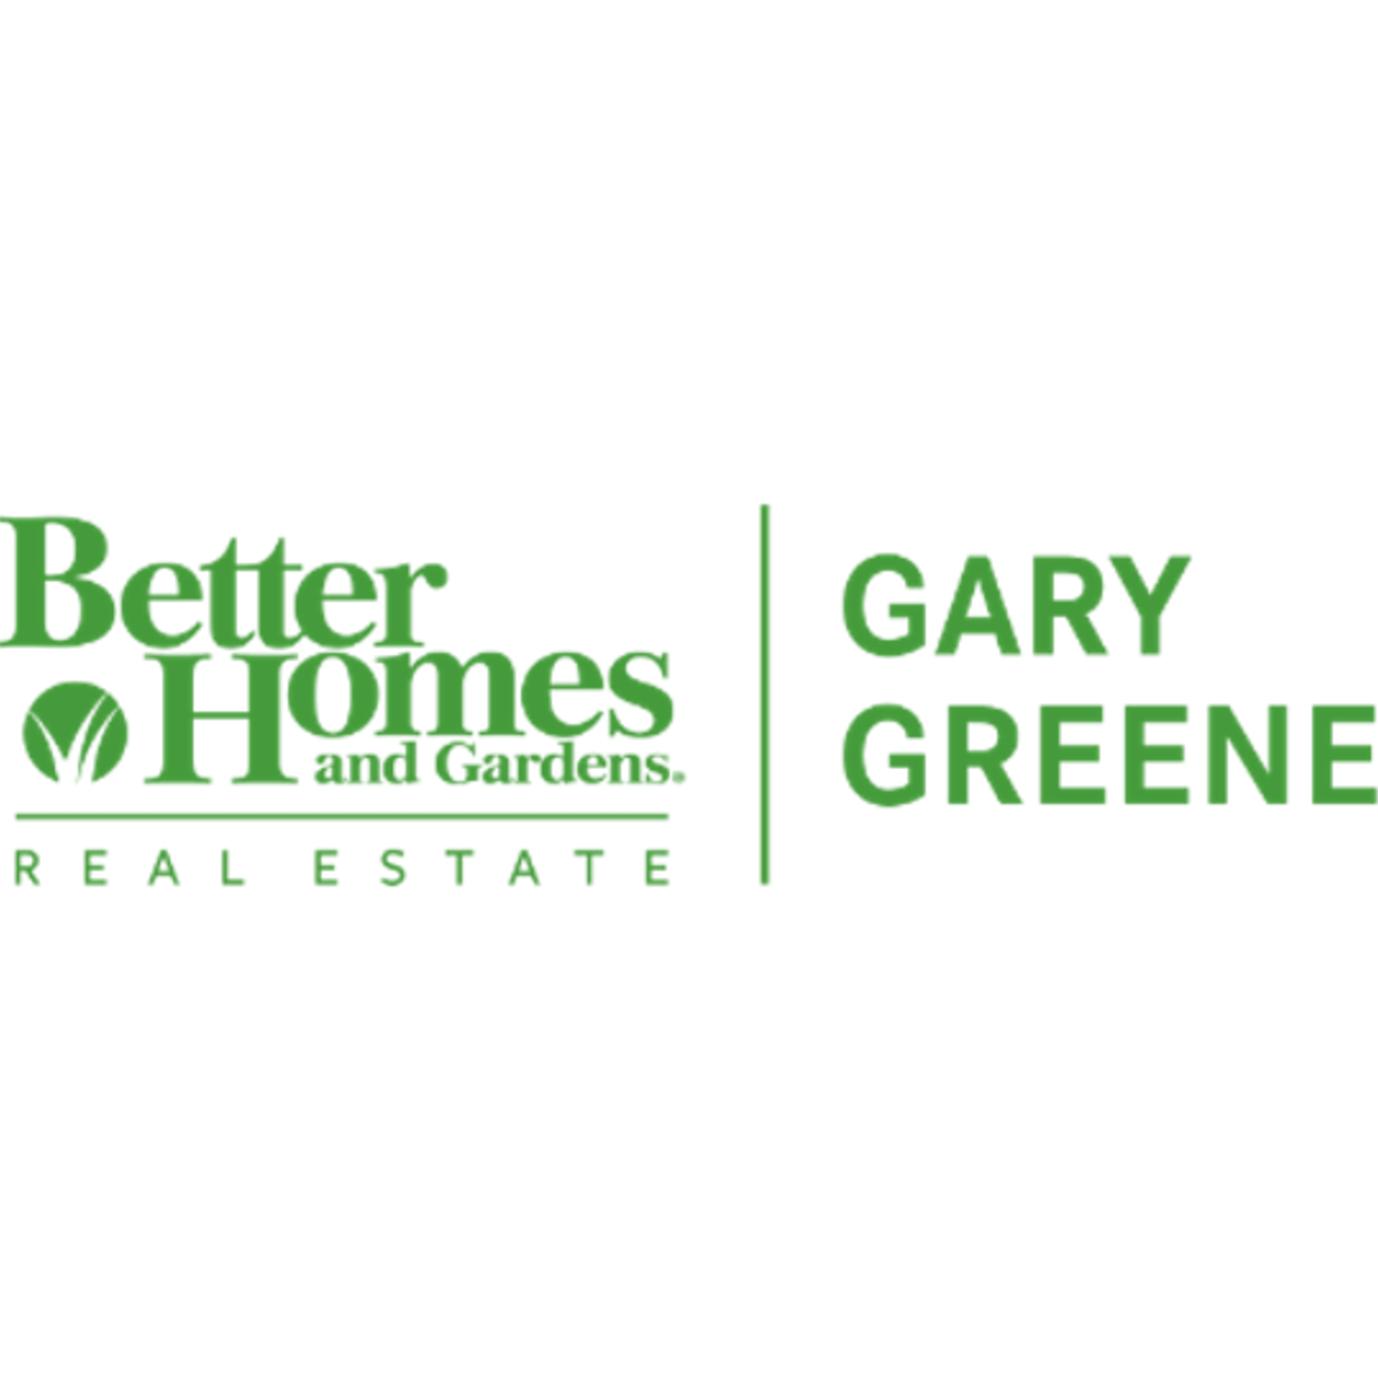 Michael Ritchie - Better Homes and Gardens - Gary Greene